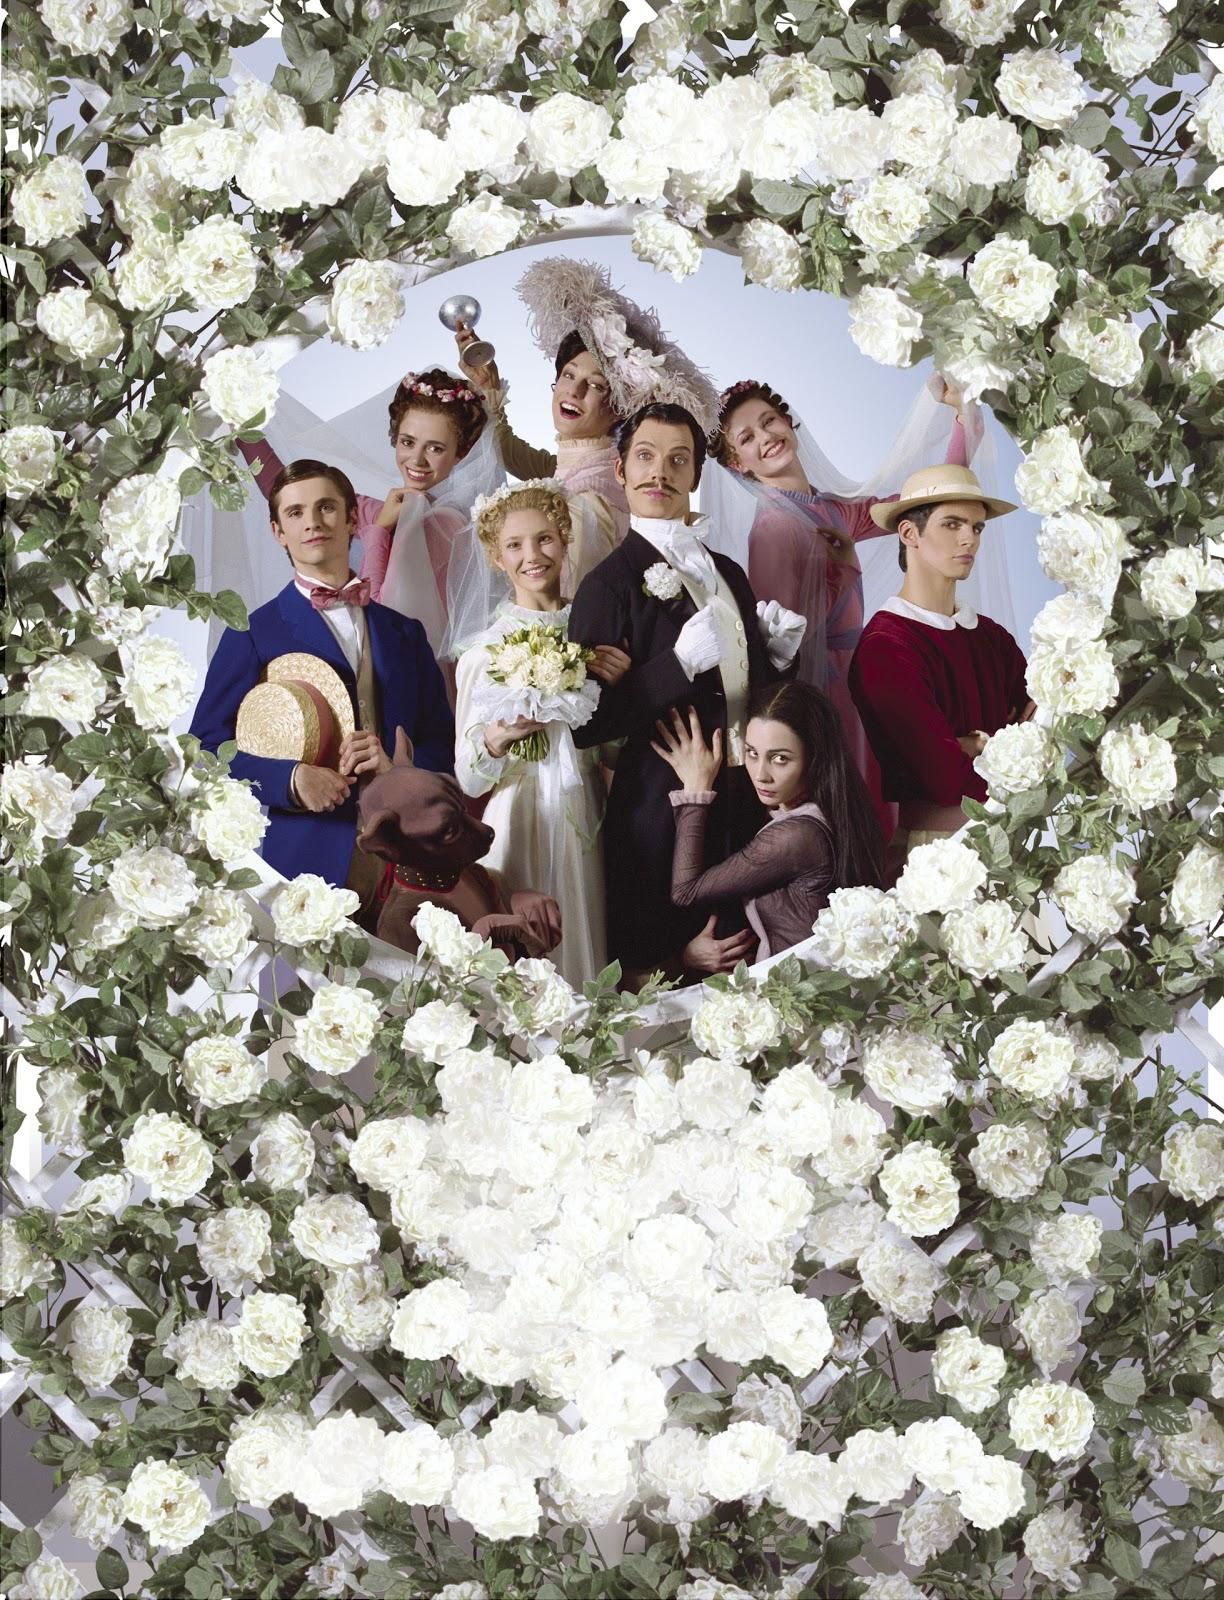 A Wedding Bouquet centre